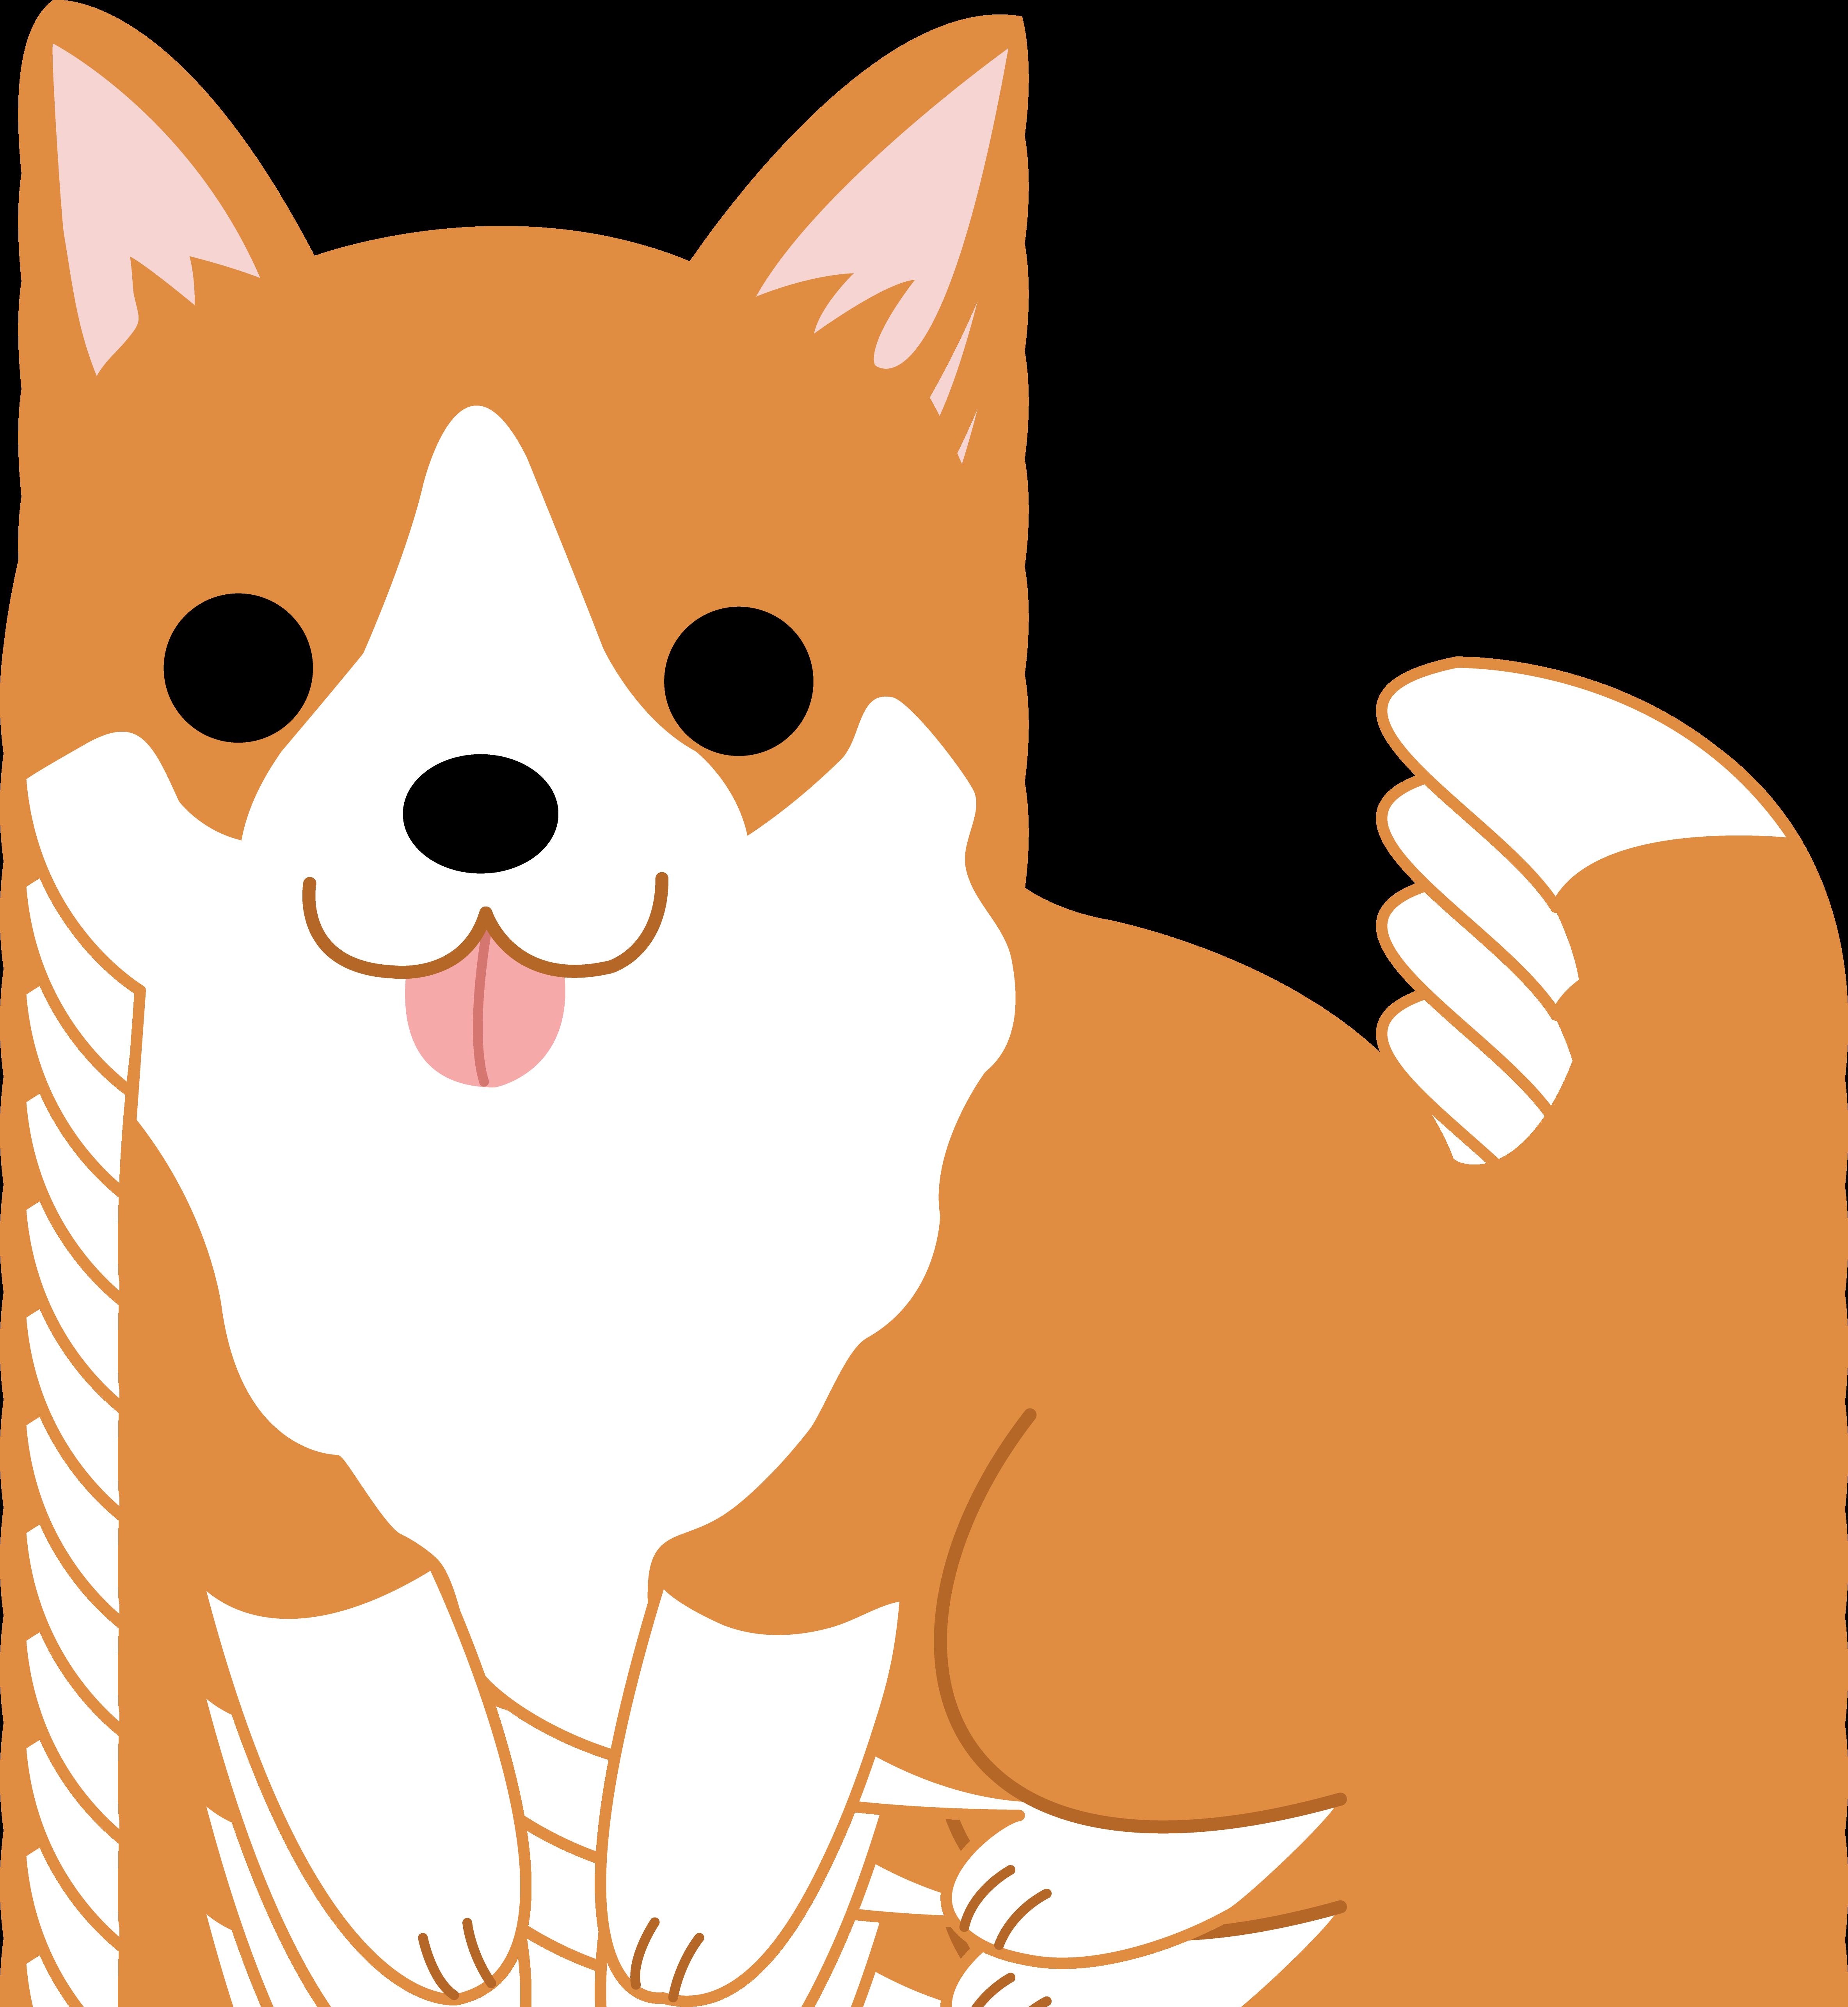 Cute Corgi Puppy Clip Art | Clipart Panda - Free Clipart Images